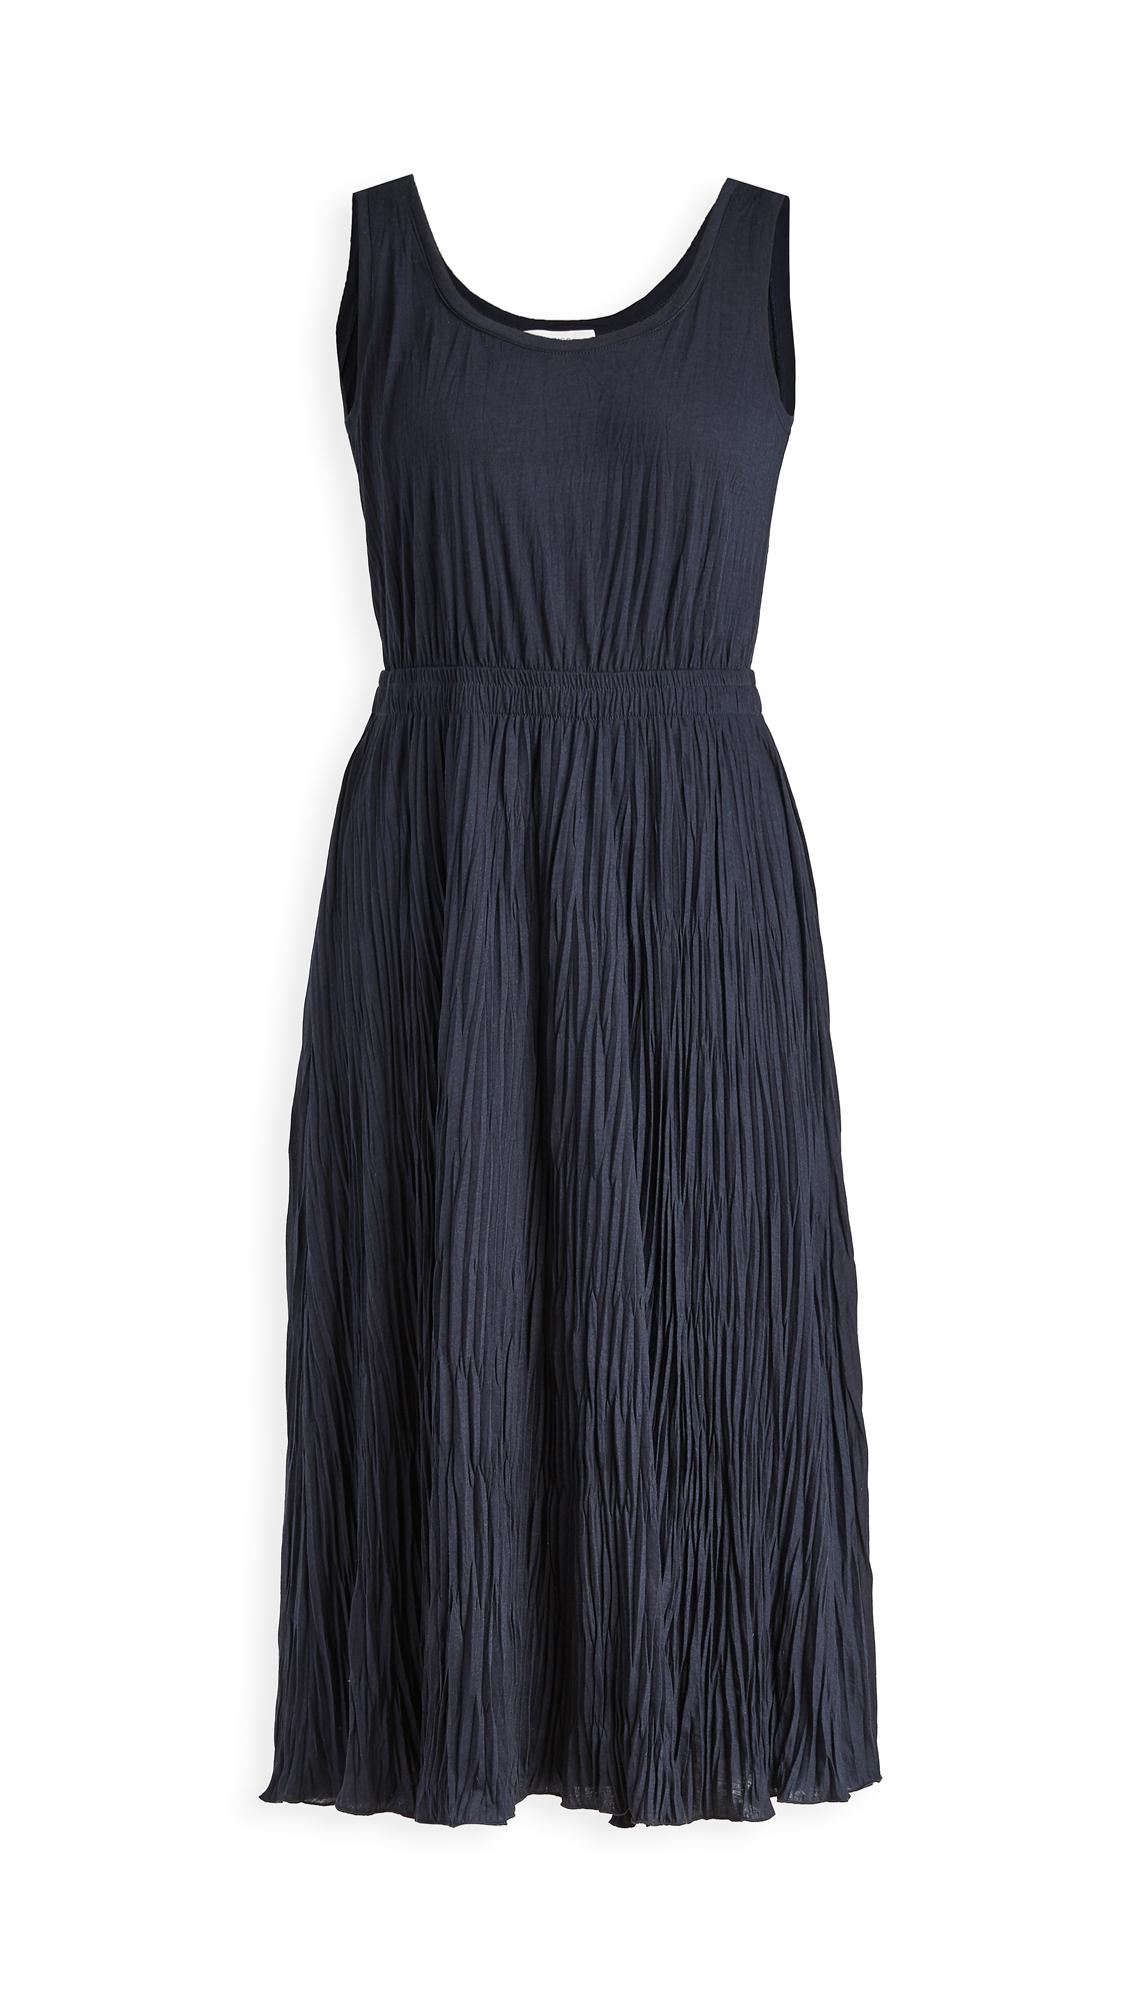 Photo of Vince Pleated Scoop Neck Tank Dress - shop Vince Clothing, Dresses online